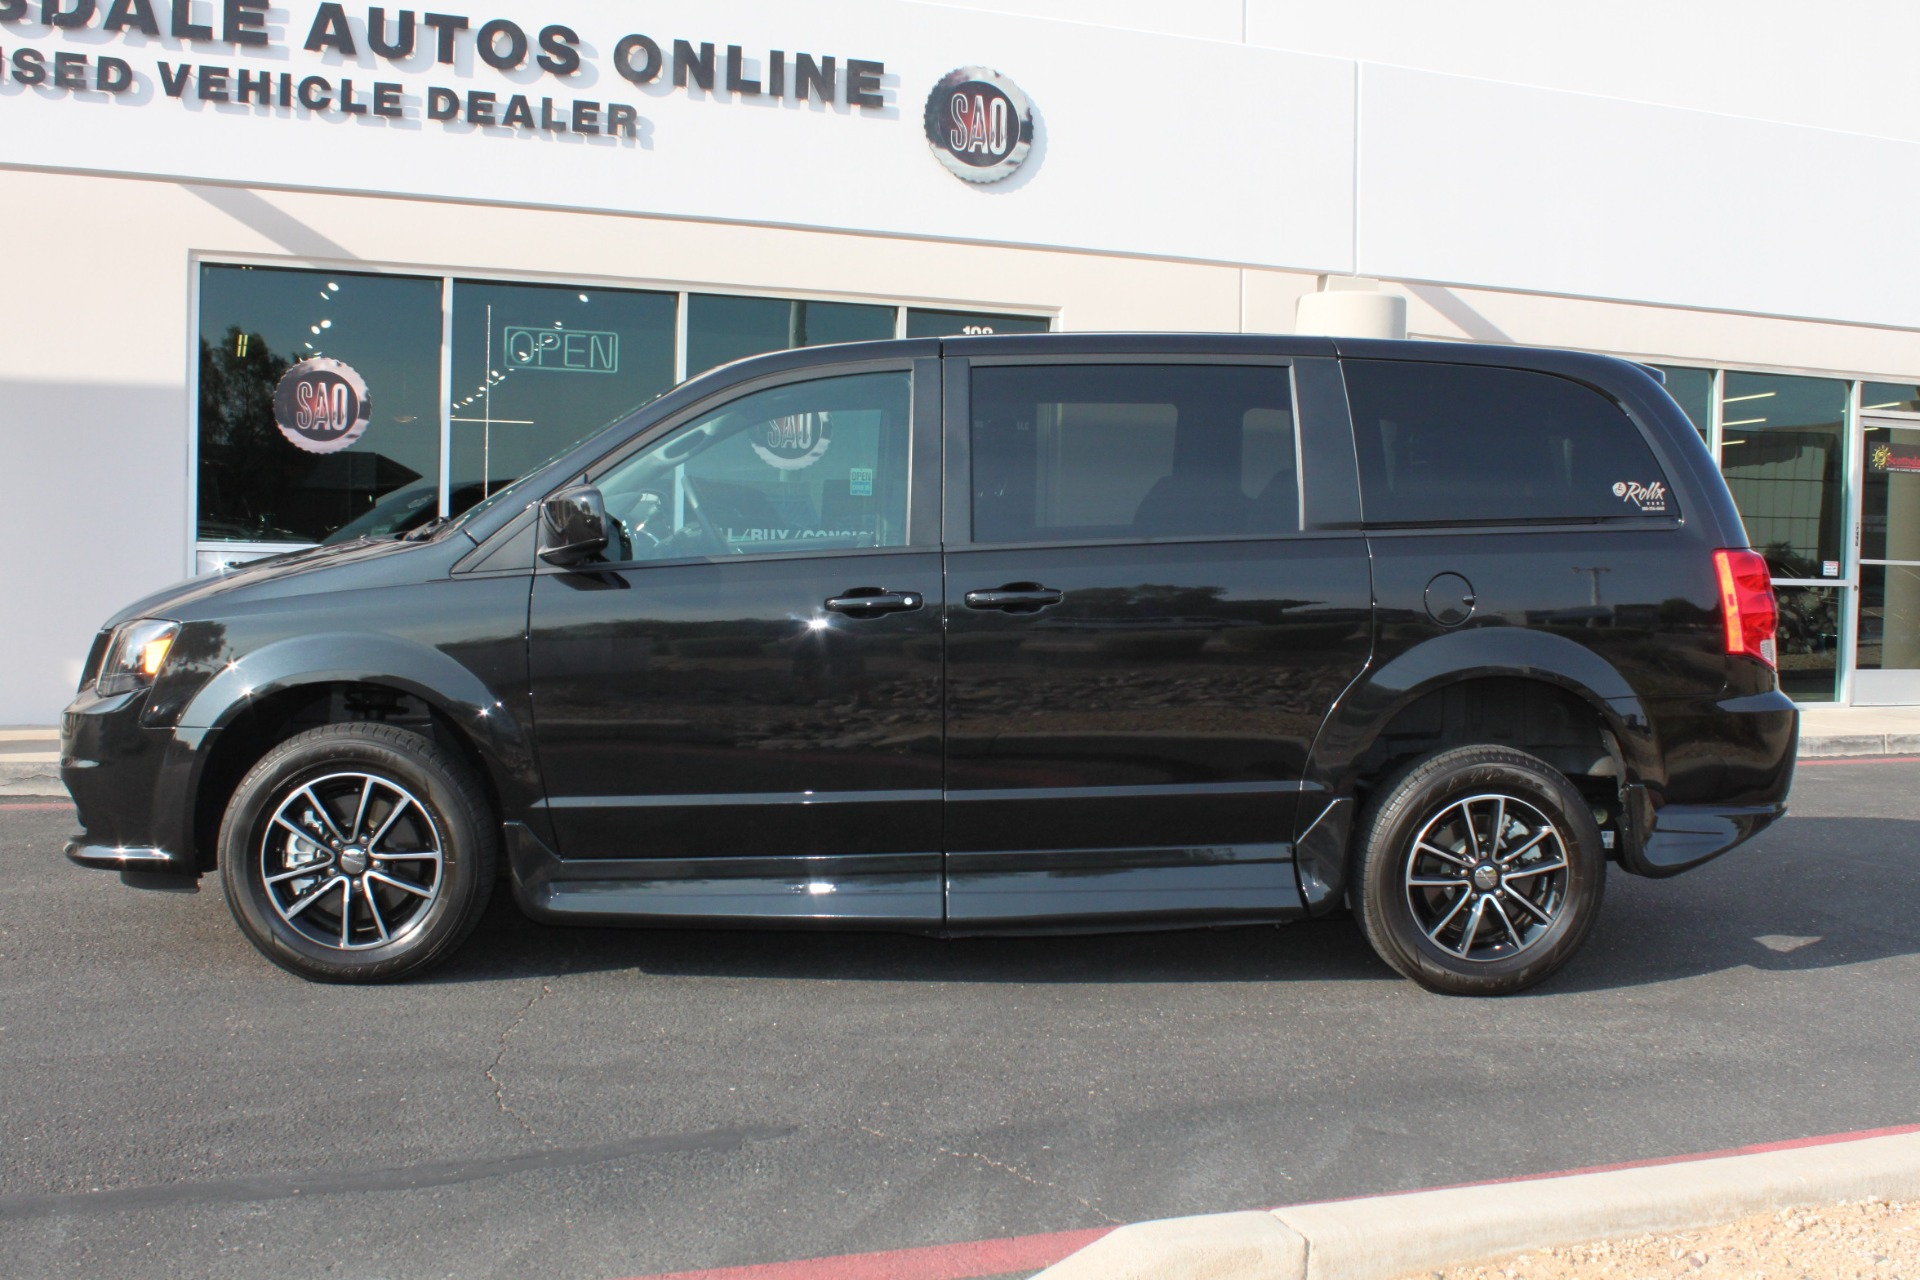 Used-2018-Dodge-Grand-Caravan-SXT-Rollx-Mobility-Conversion-Wagoneer